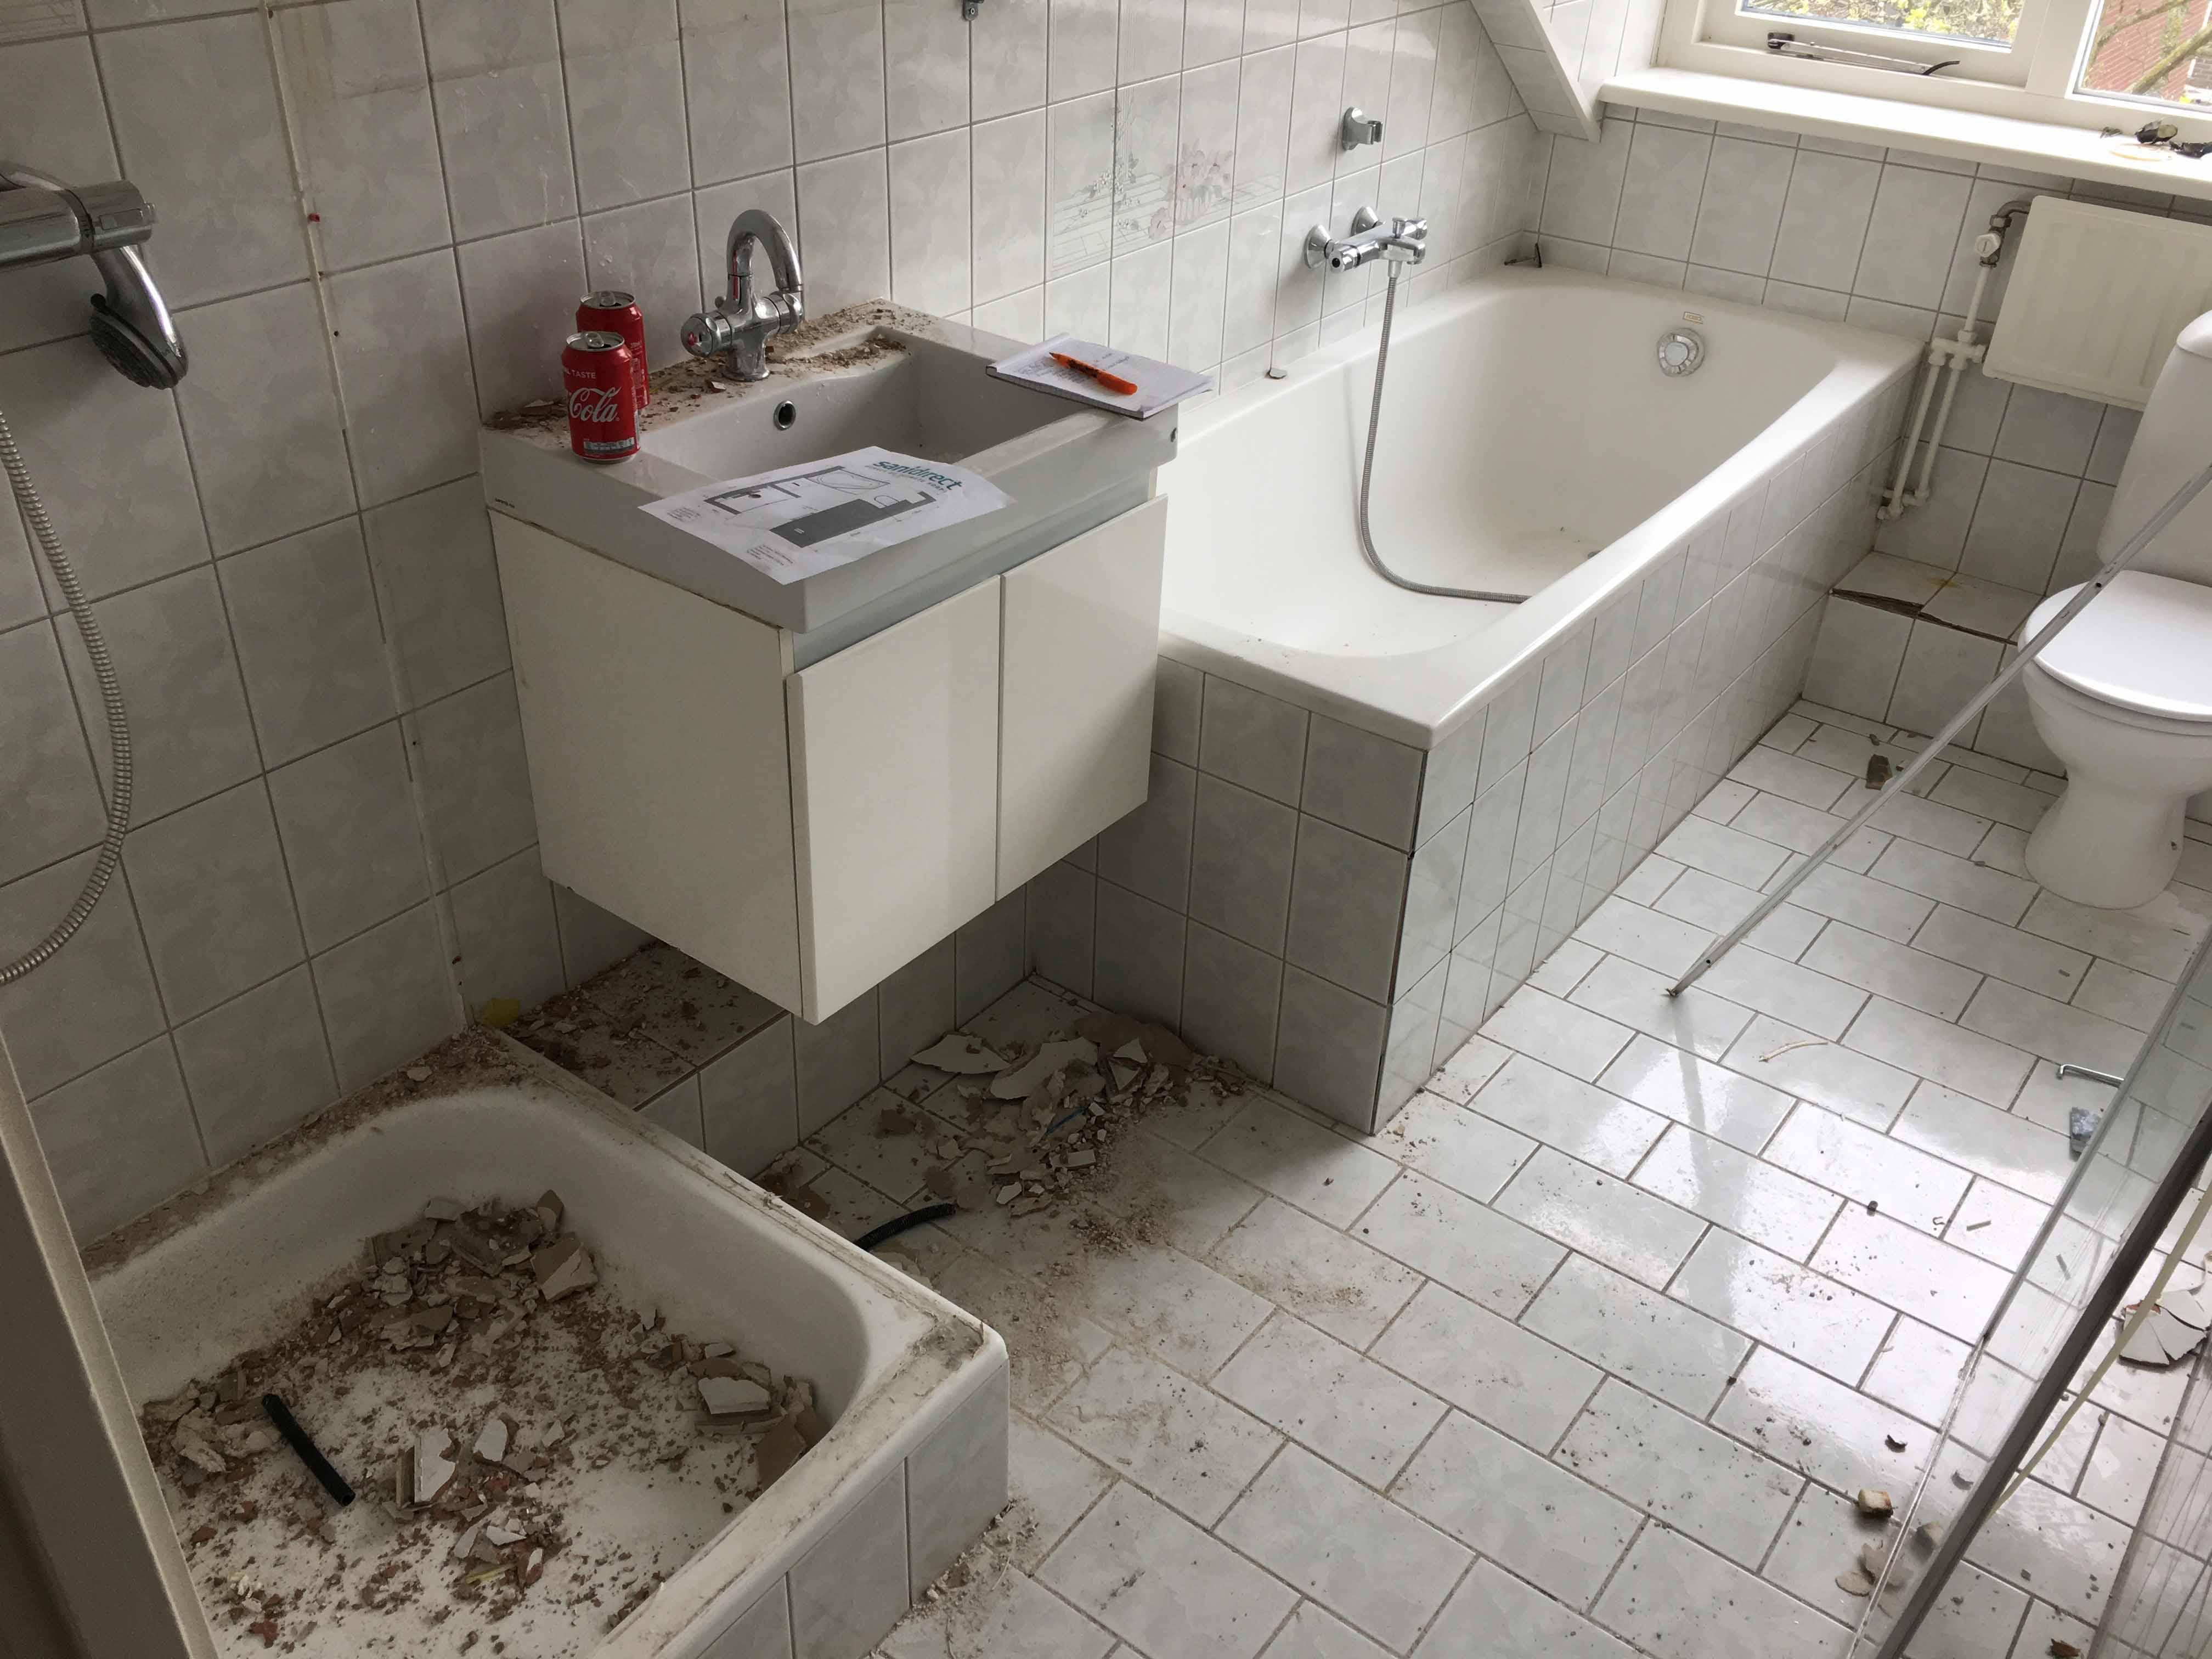 https://www.woodmancrafts.nl/wp-content/uploads/2018/08/IMG_5006.jpg